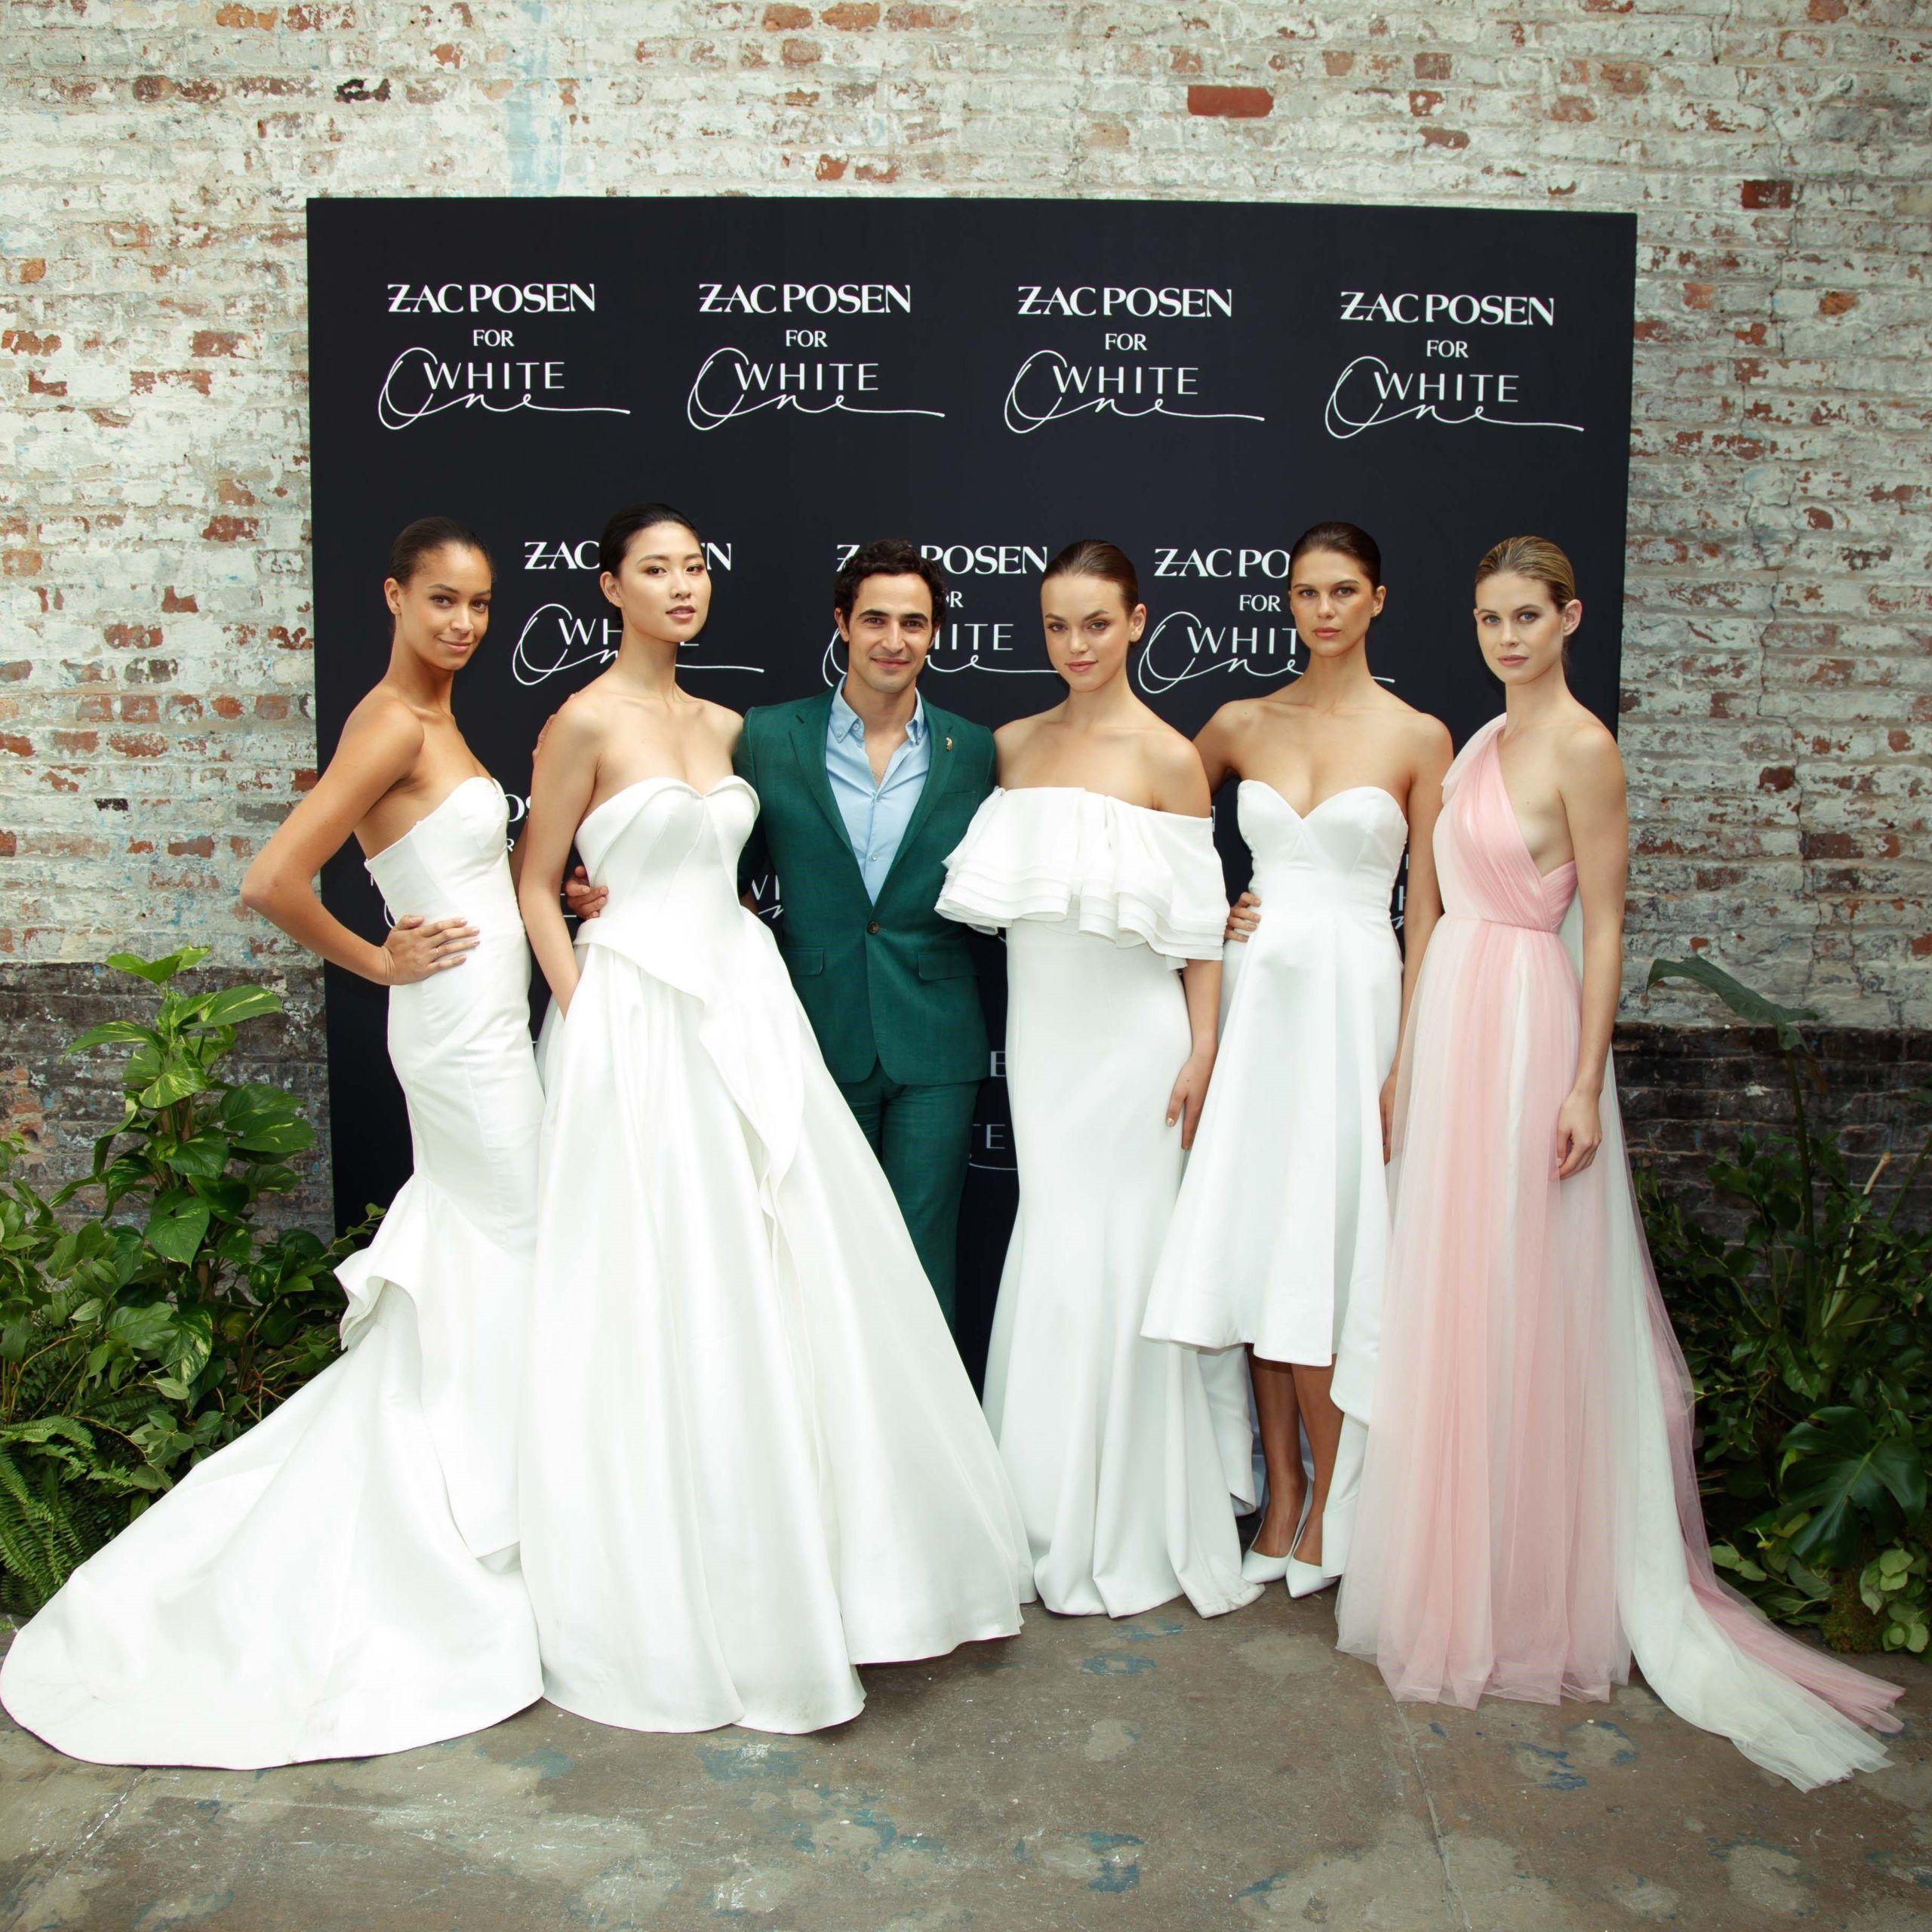 Zac Posen For White One Bridal Wedding Dress Collection Throughout Wedding Dresses Zac Pos In 2020 Bridal Wedding Dresses Amazing Wedding Dress Wedding Dresses Near Me [ 2560 x 2560 Pixel ]